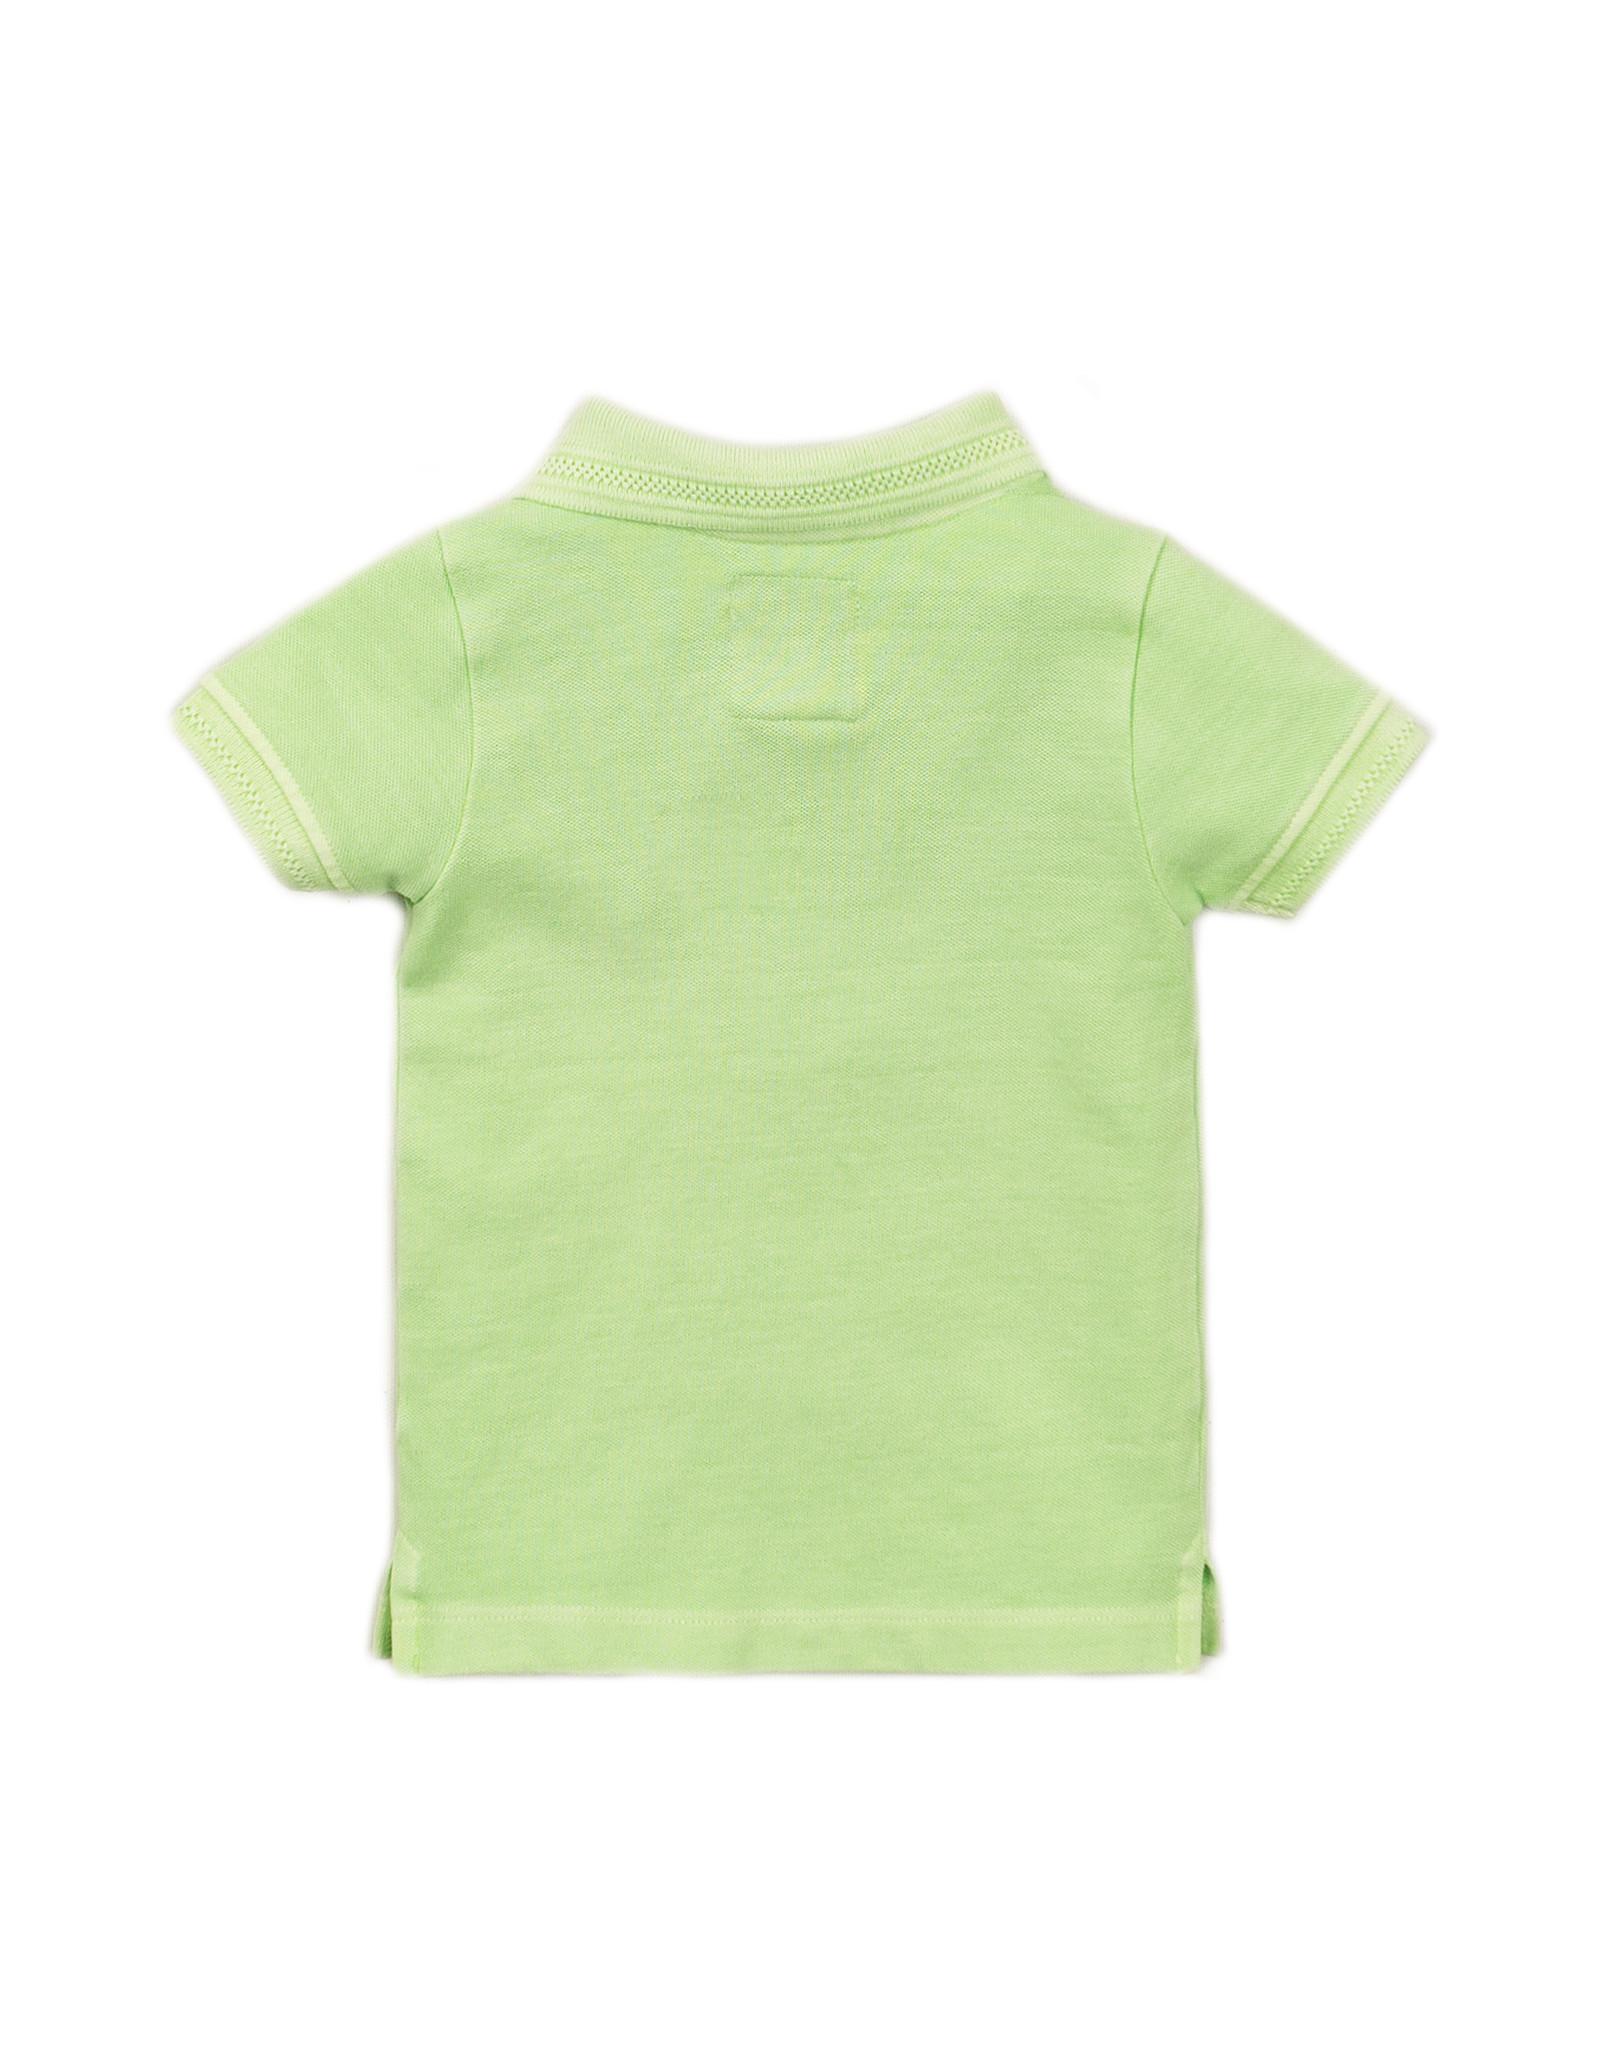 Koko Noko Polo ss, Faded neon green, SS21